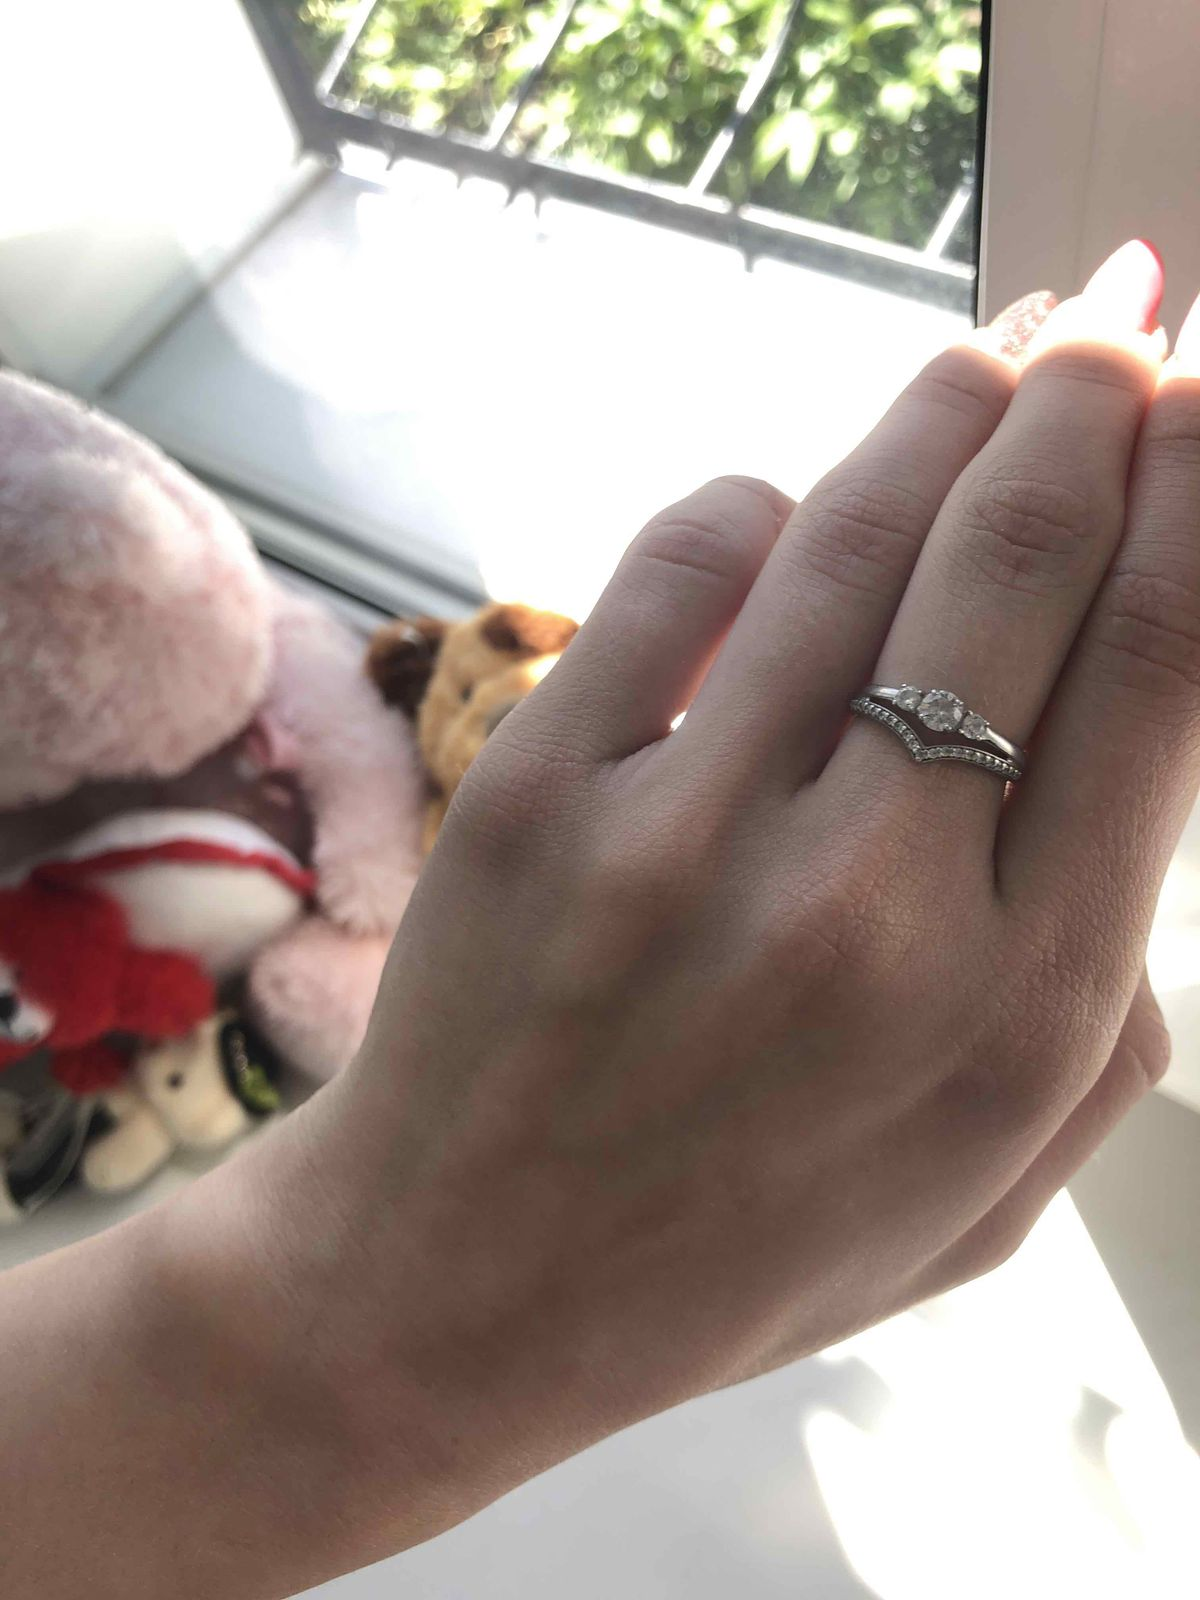 SUNLIGHT спасибо за кольцо